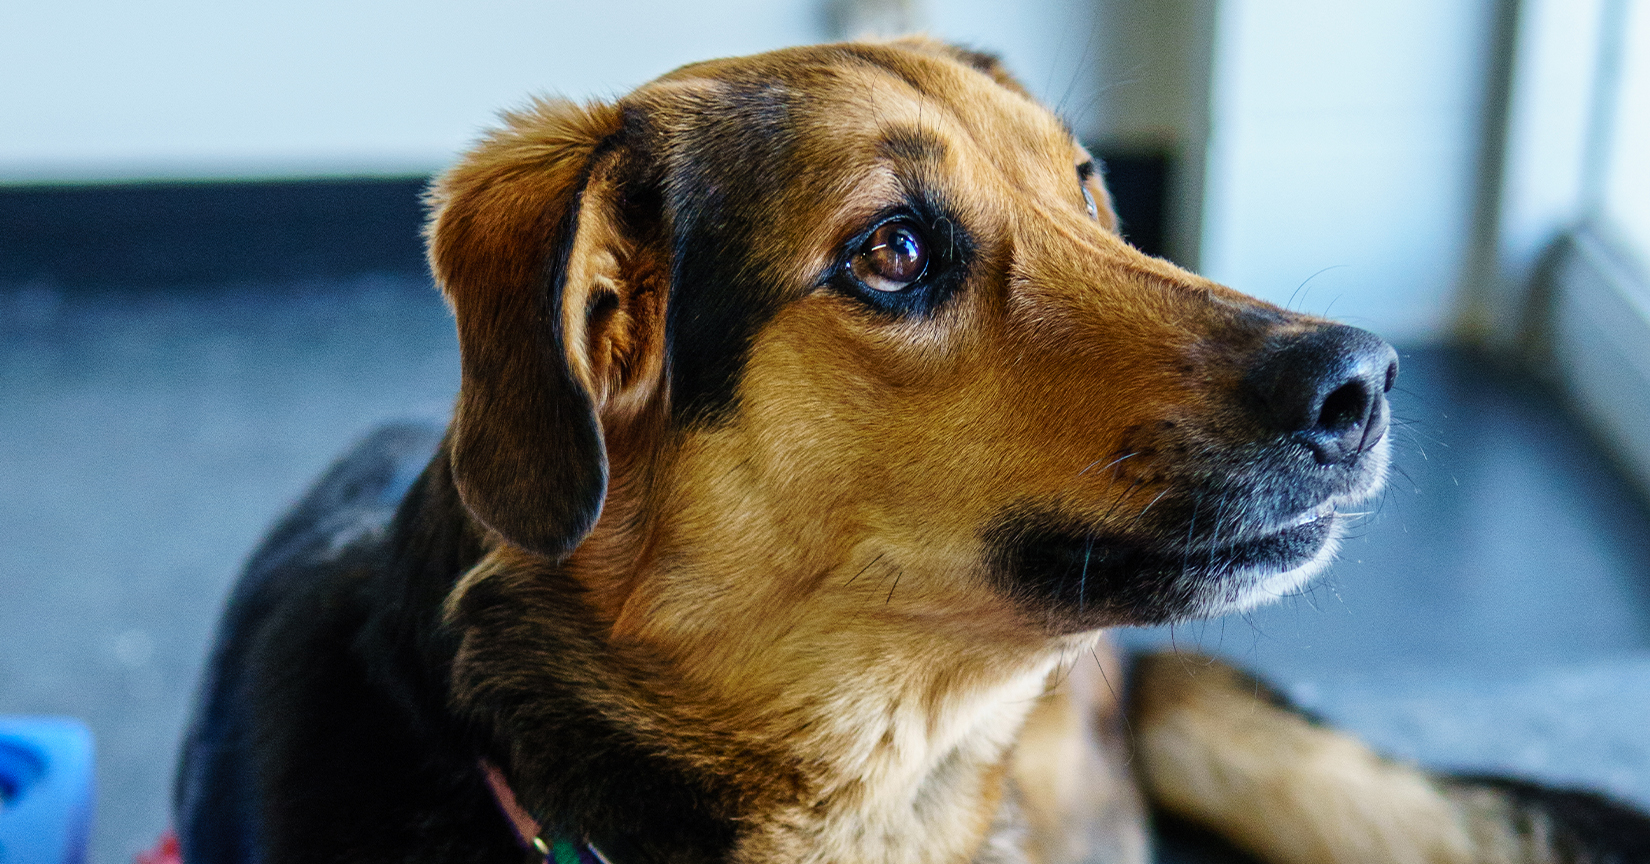 dog indoors looking up